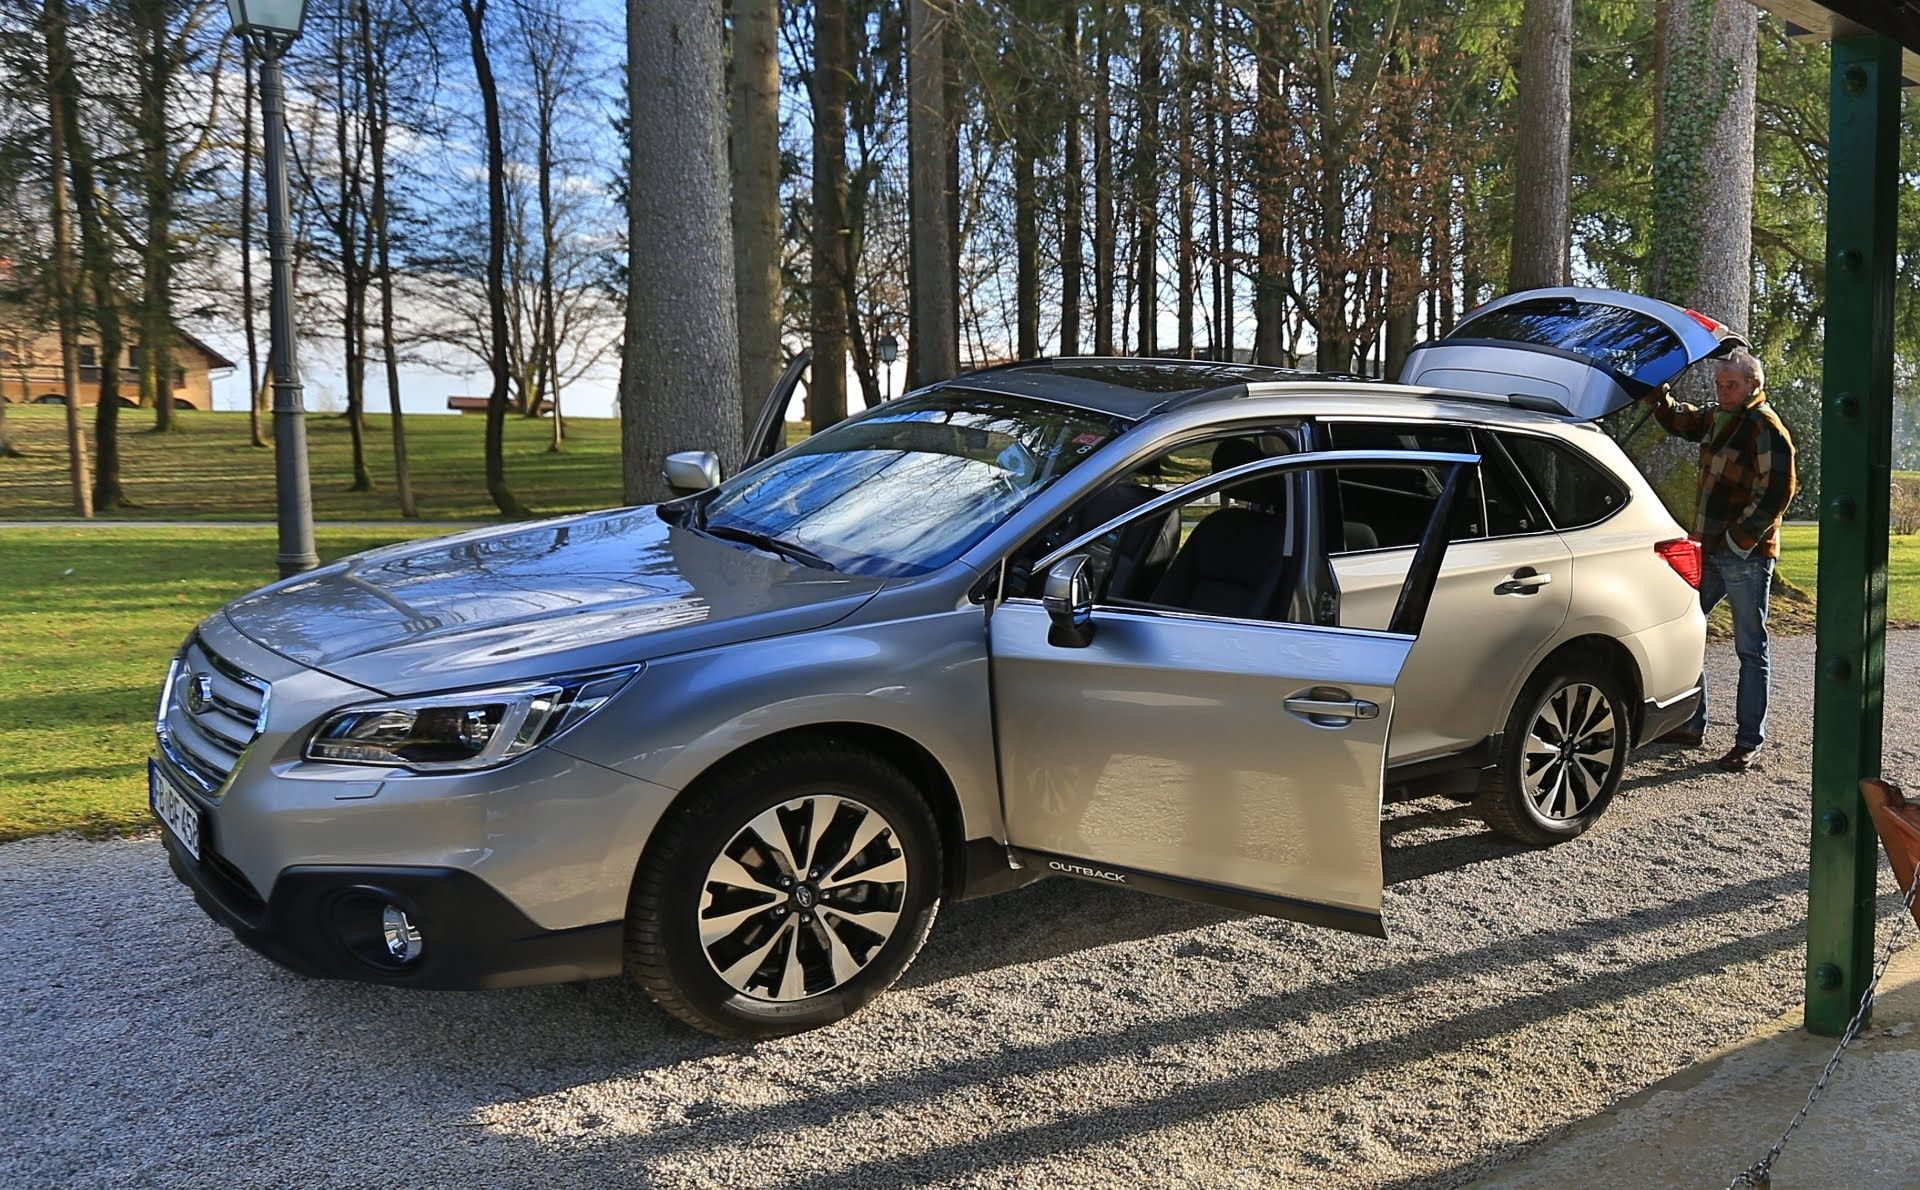 2020 Subaru Crosstrek 2020 Subaru Outback New 2015 Subaru Outback 2